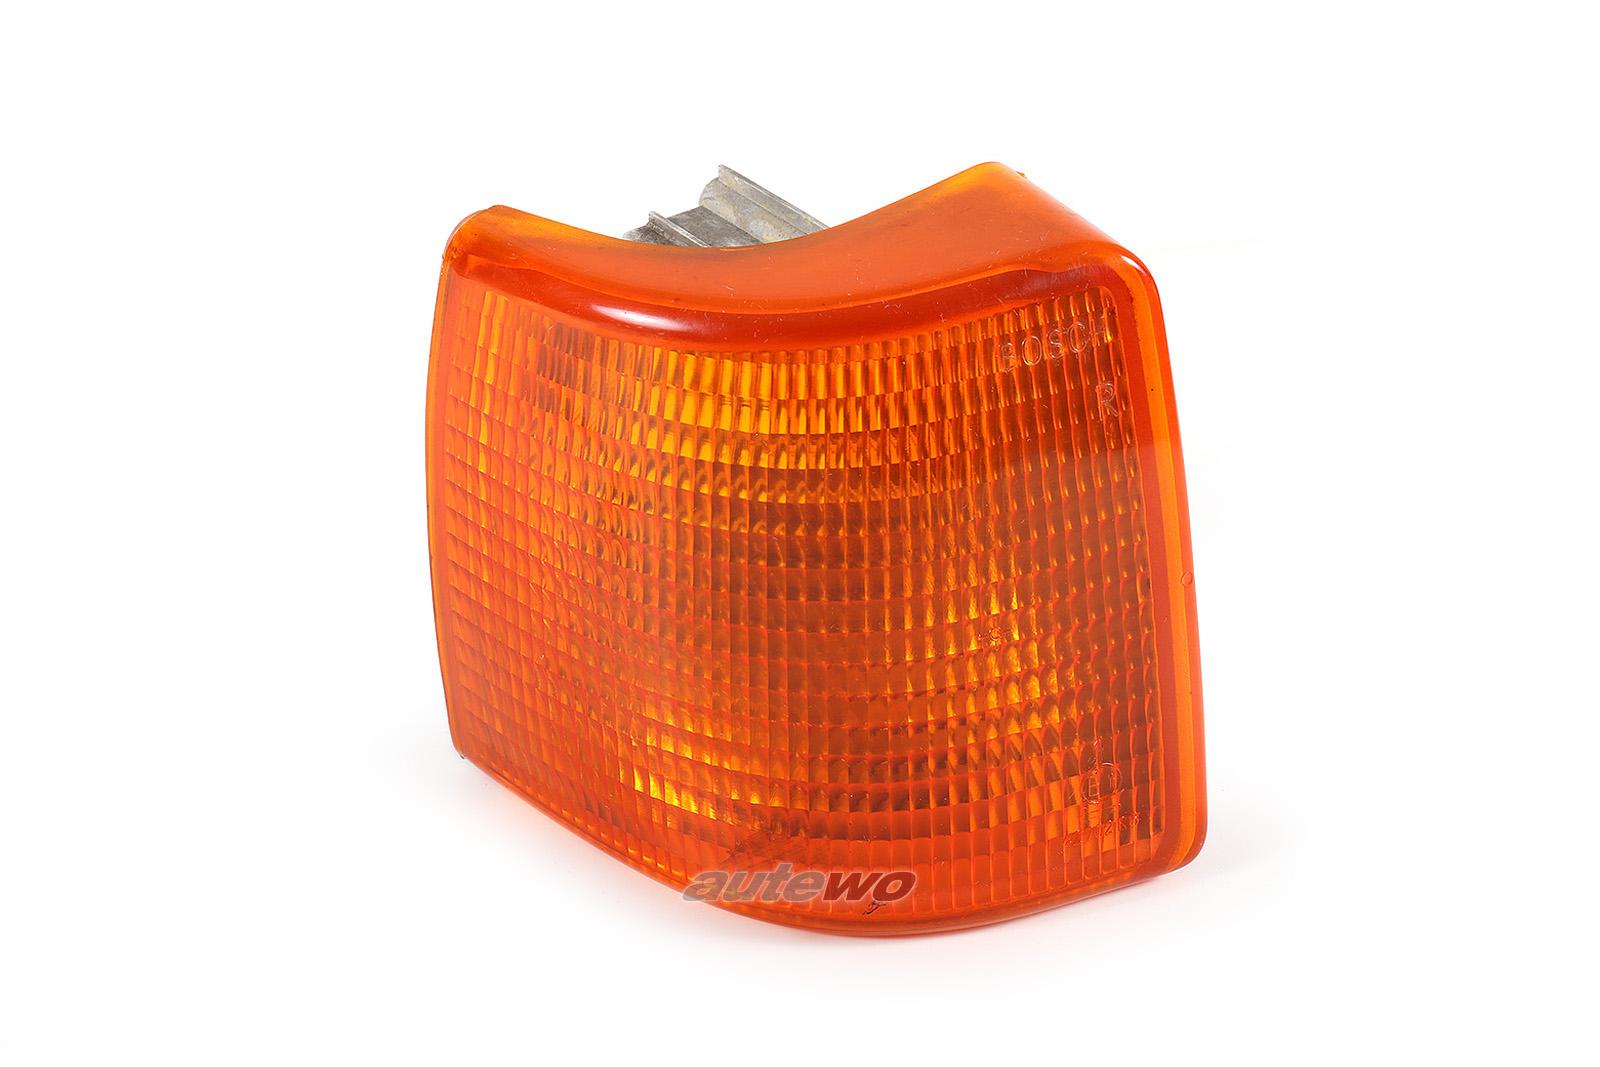 811953050F Audi 80 Typ 81/85 Blinker Bosch Vorne Rechts orange